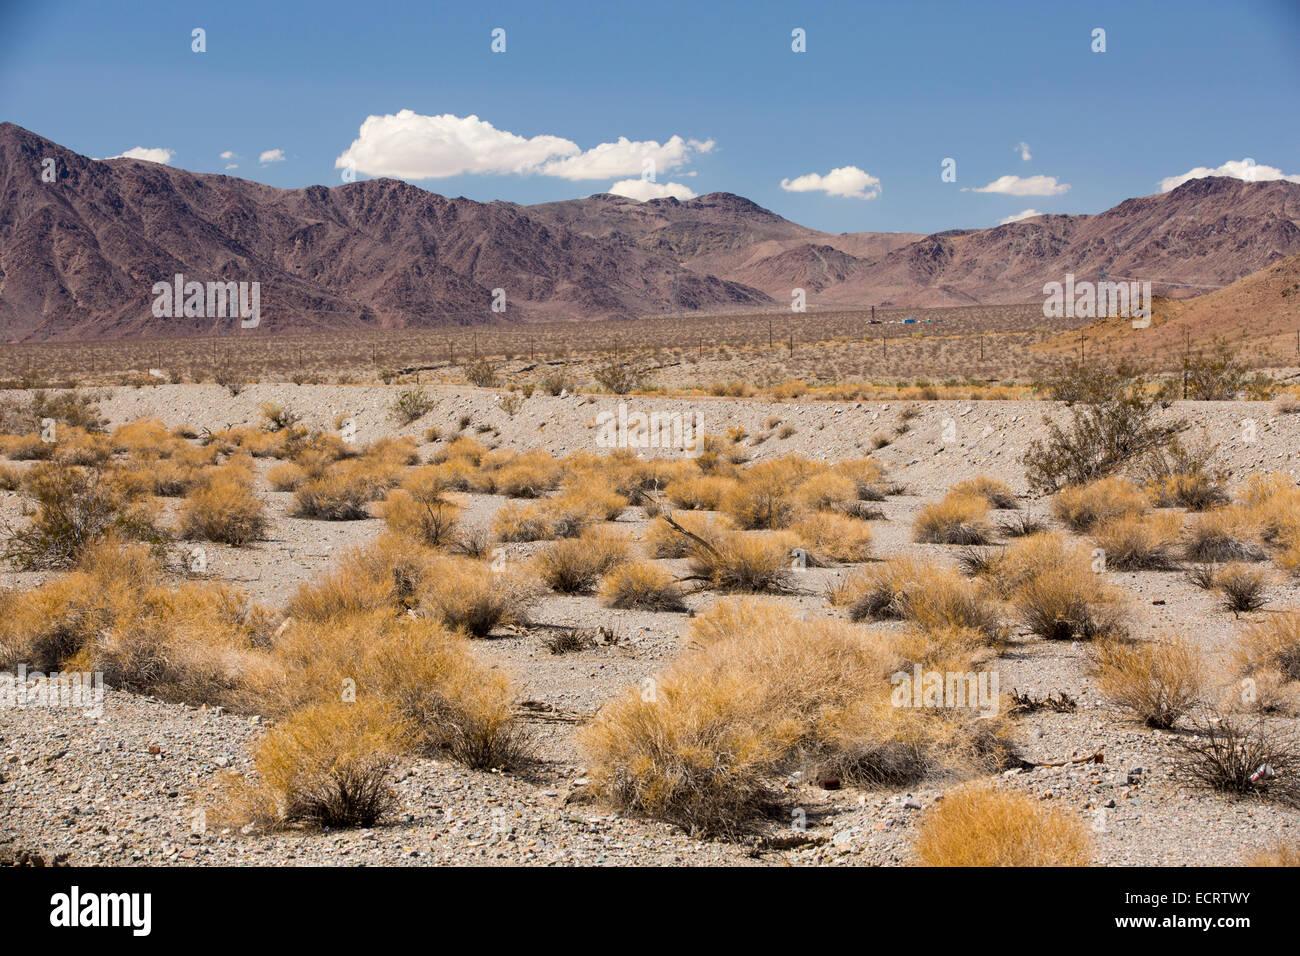 Tumbleweed growing in the Mojave Desert in California, USA. - Stock Image